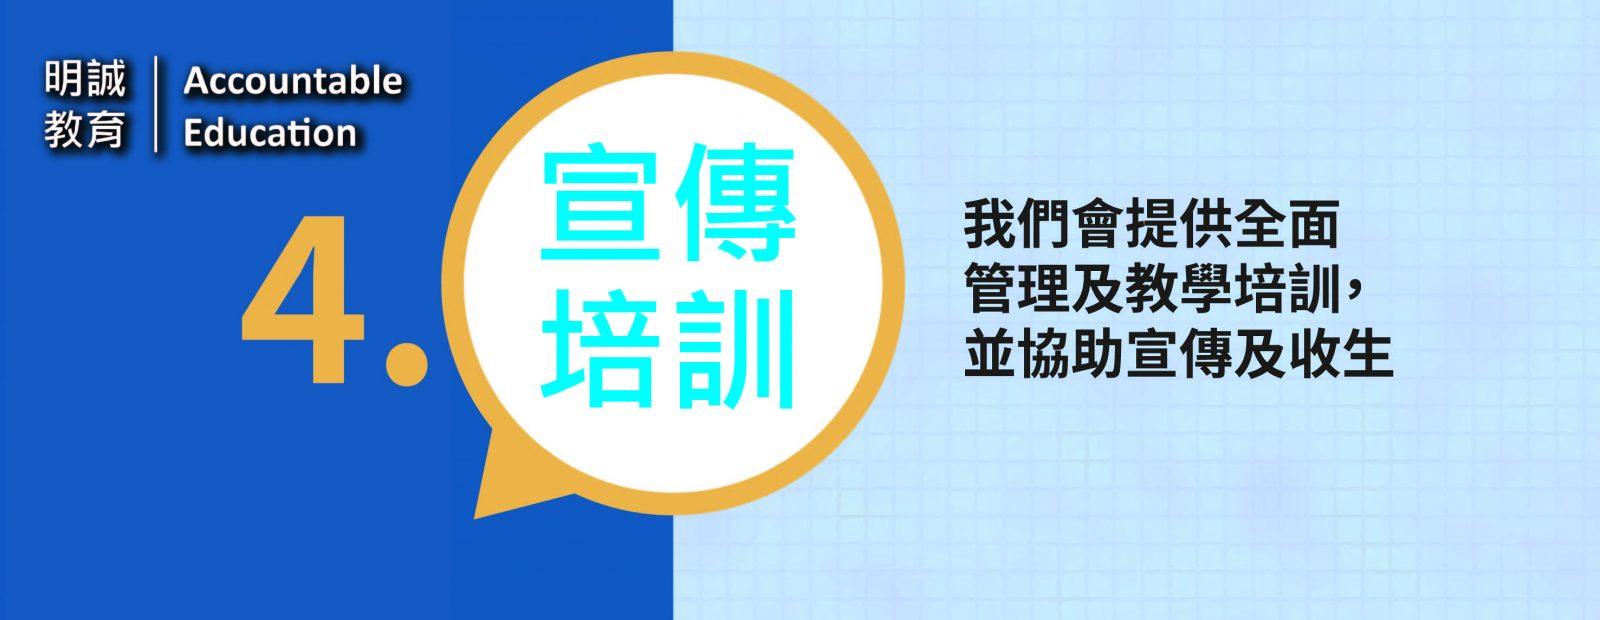 AE Web franchise banner-04